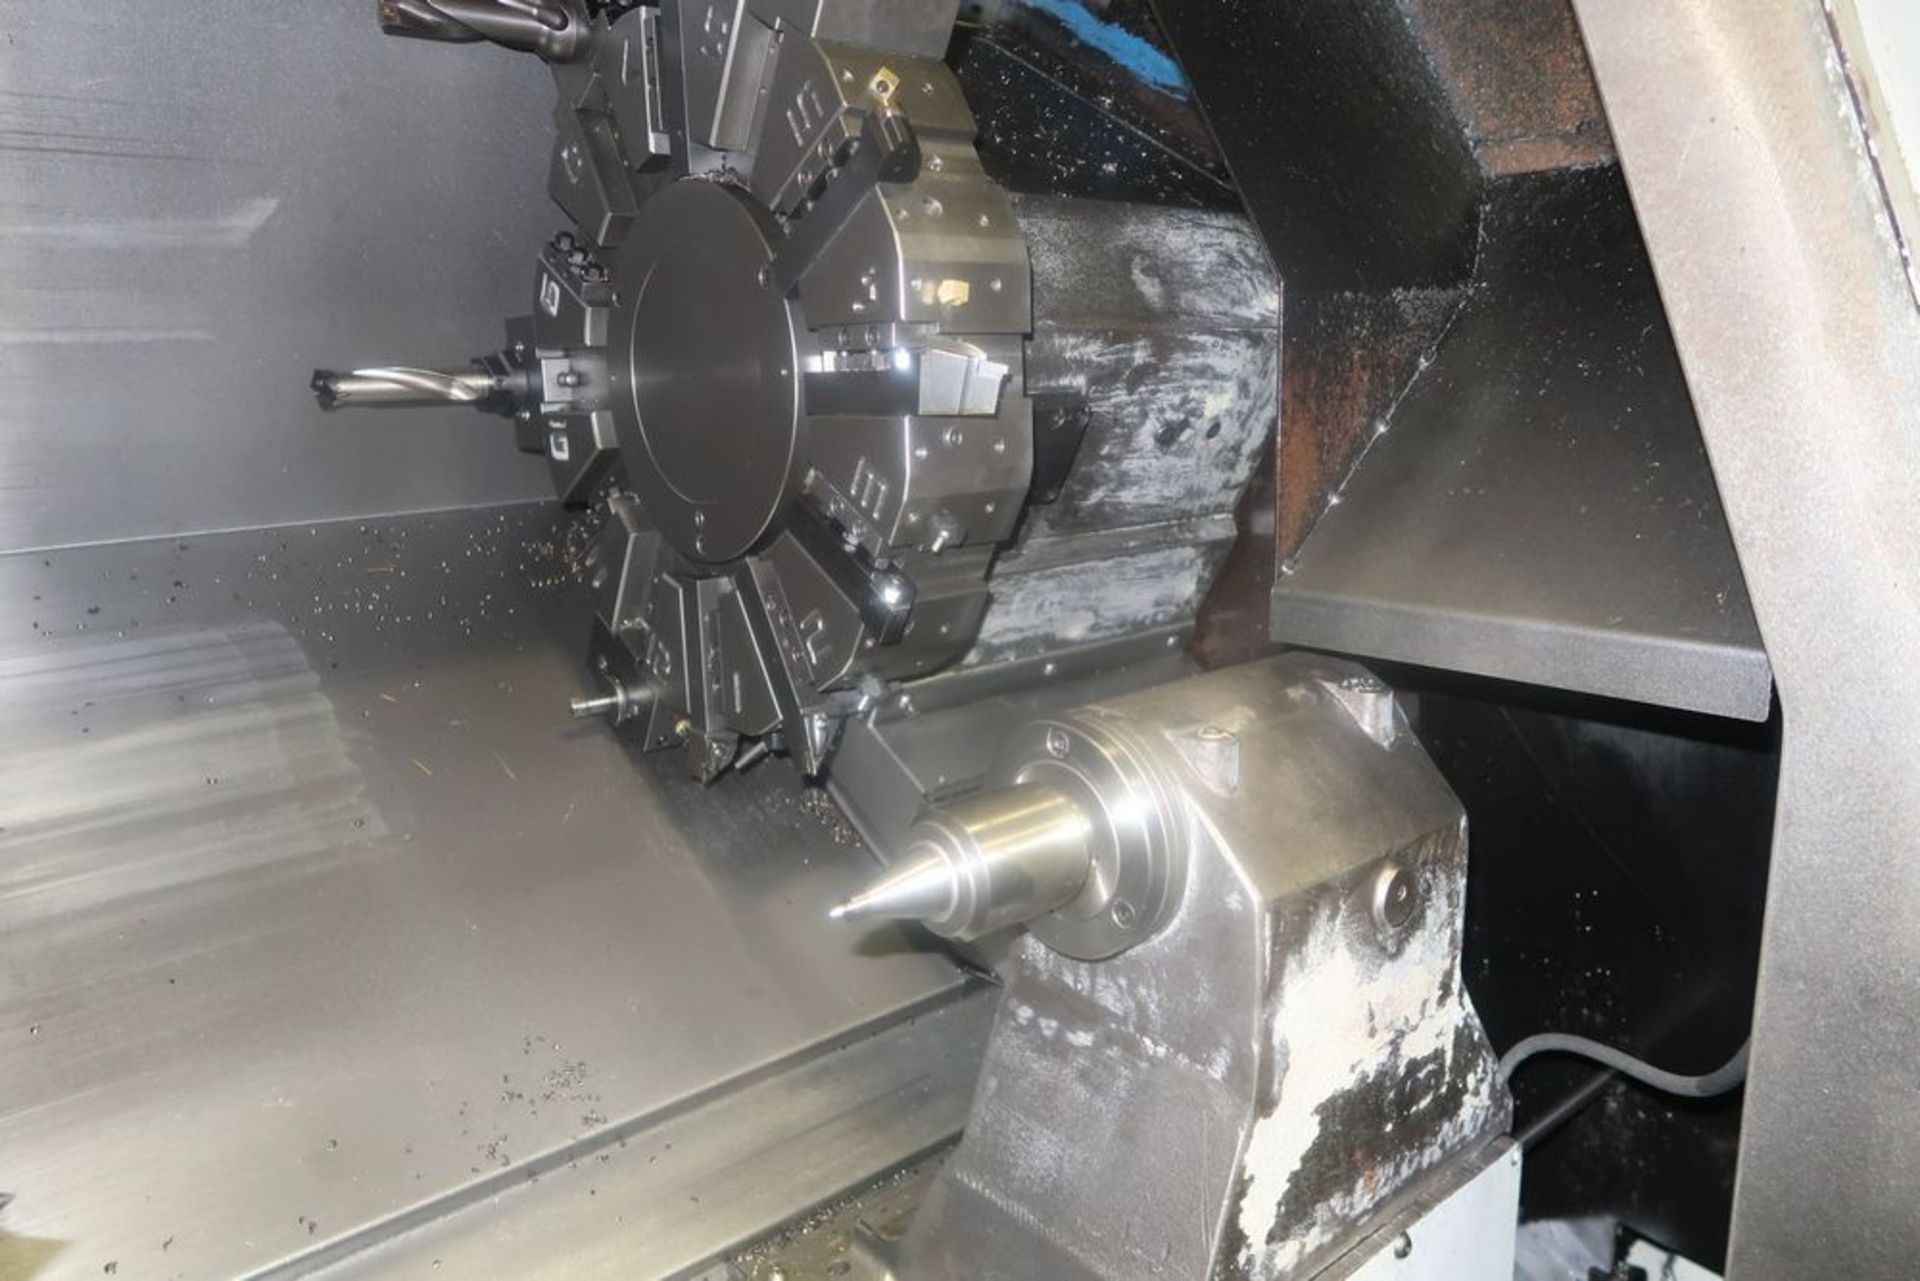 Lot 19 - Mazak Quick Turn Nexus 200 2-Axis CNC Turning Center Lathe, S/N 162571